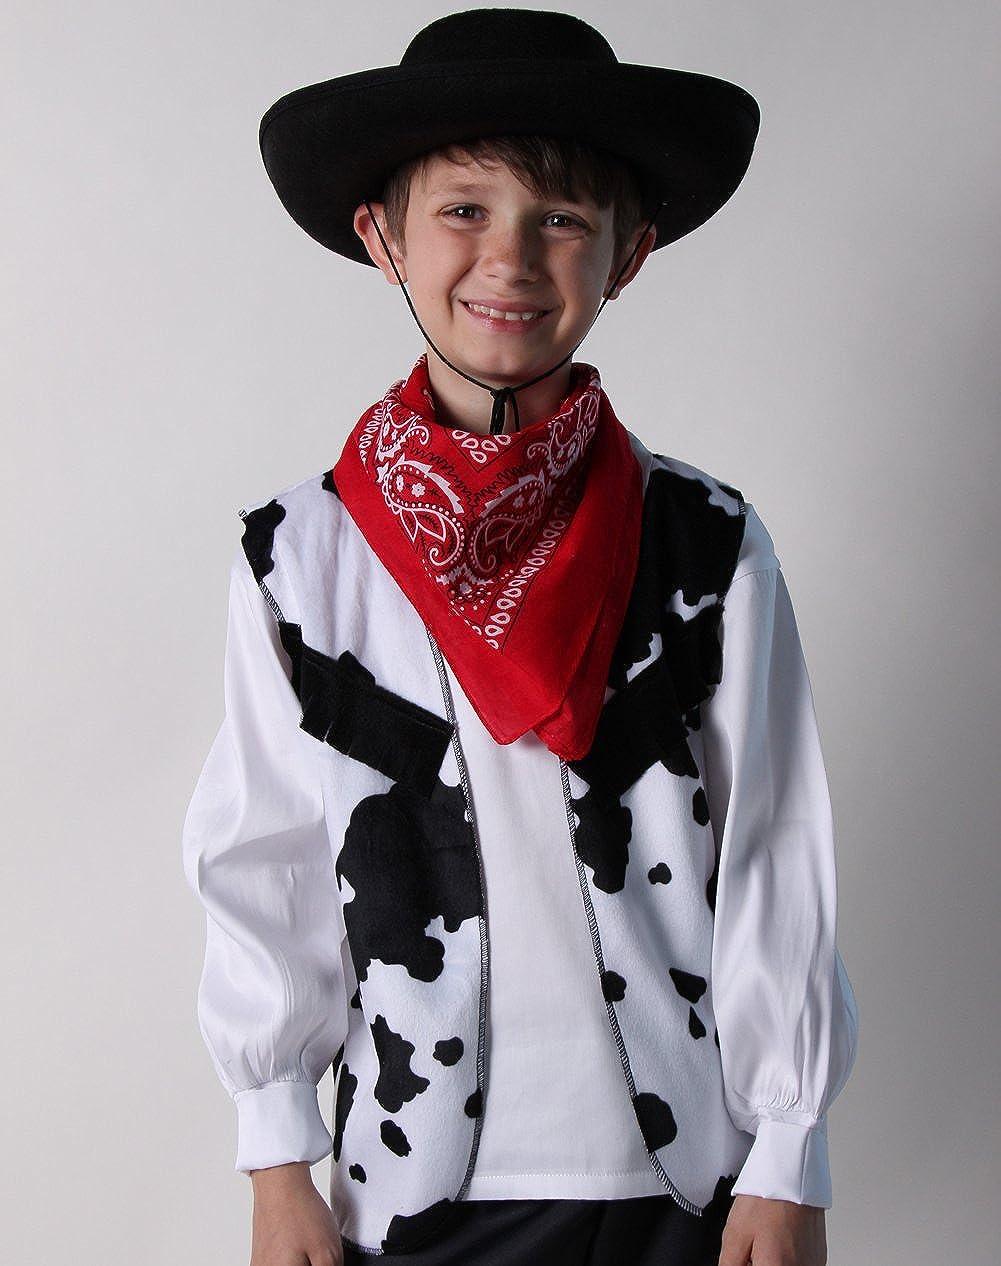 Making Believe Felt Hat Kids Western Cowboy Costume Set Choose Color and Size Bandanna Vest Chaps